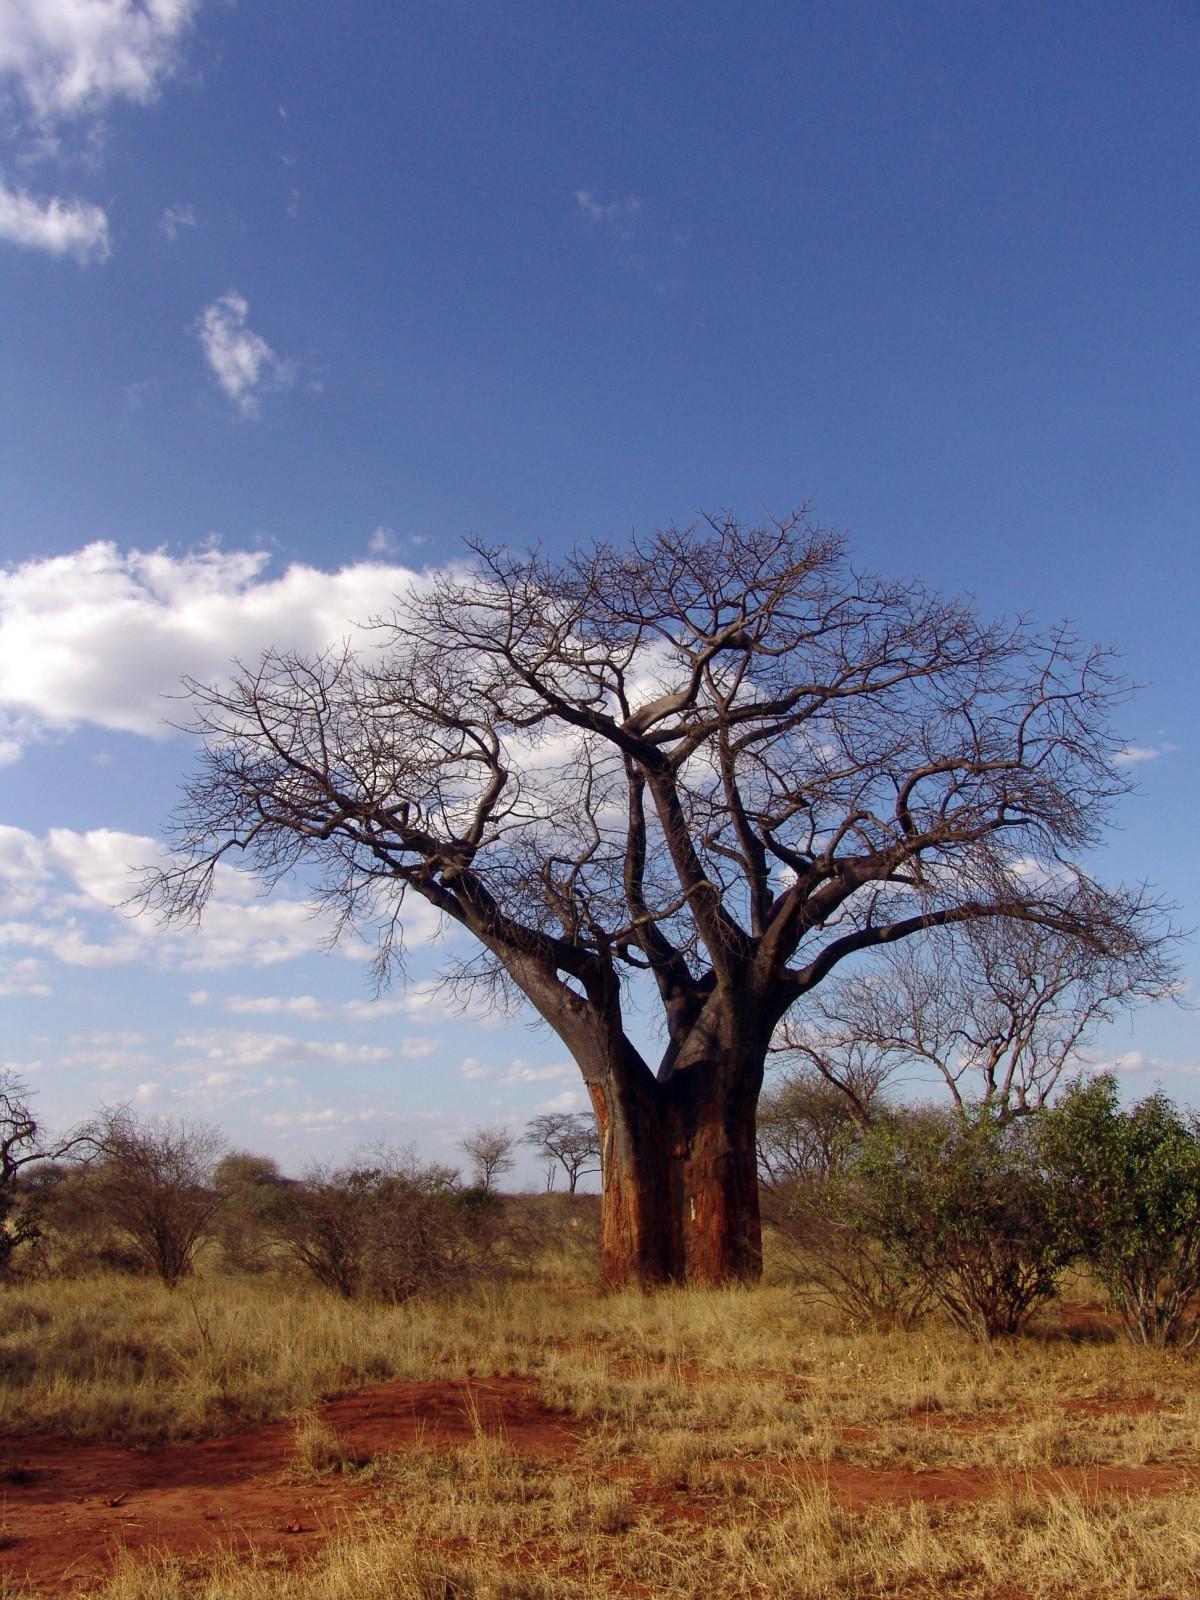 images gratuites arbre branche plante fleur brindille mains des doigts baobab. Black Bedroom Furniture Sets. Home Design Ideas